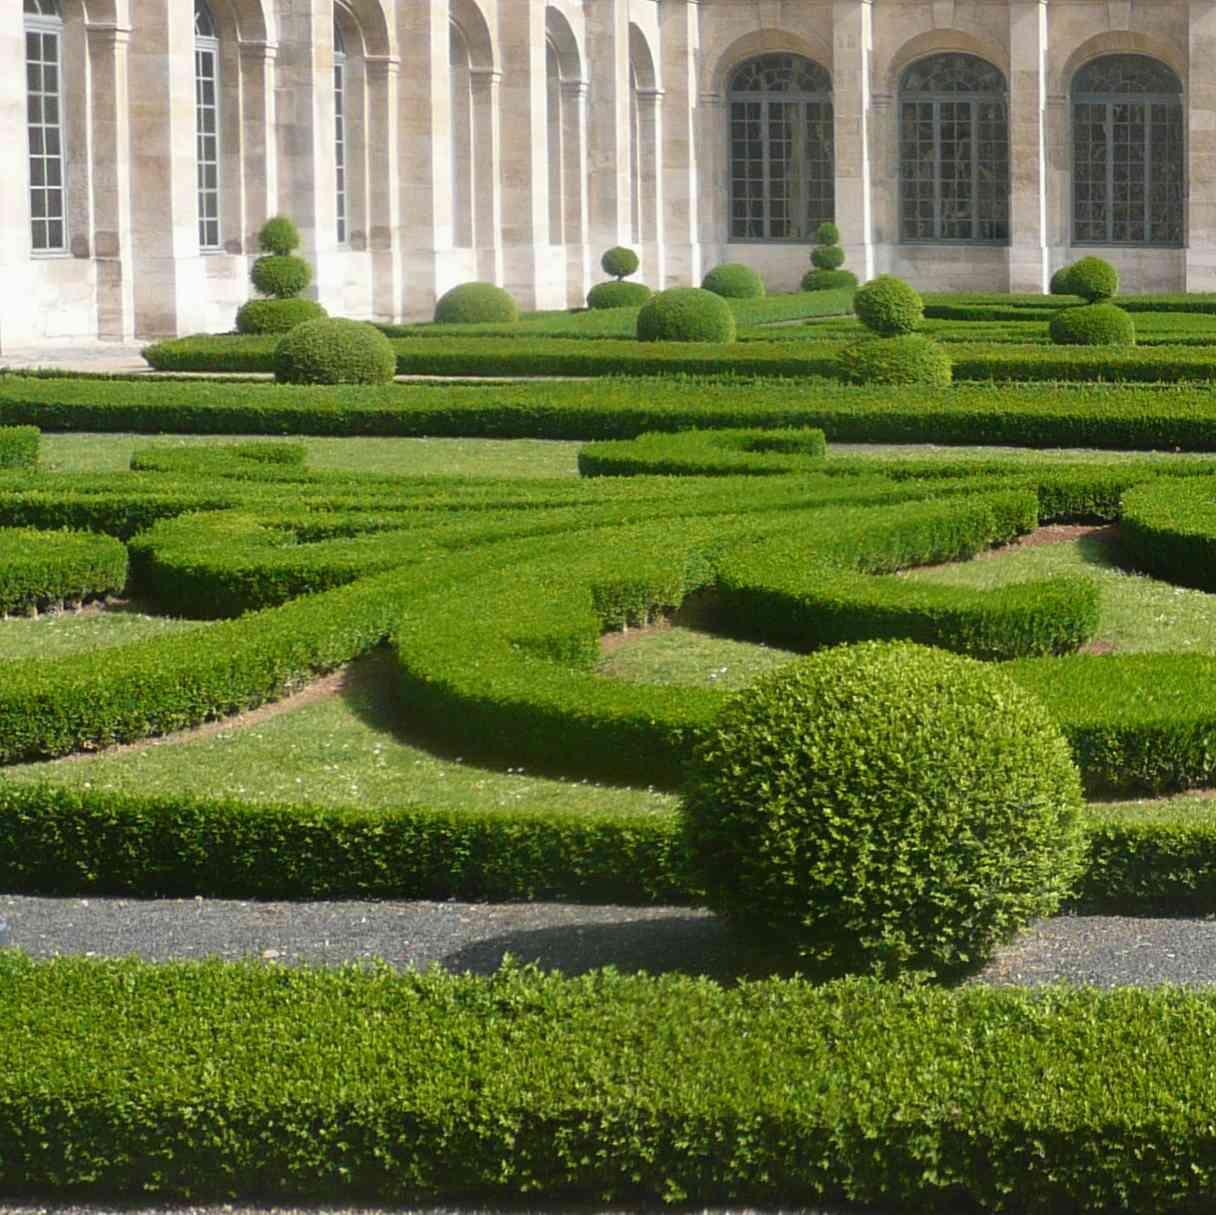 Jardin cloitre St Denis 2011